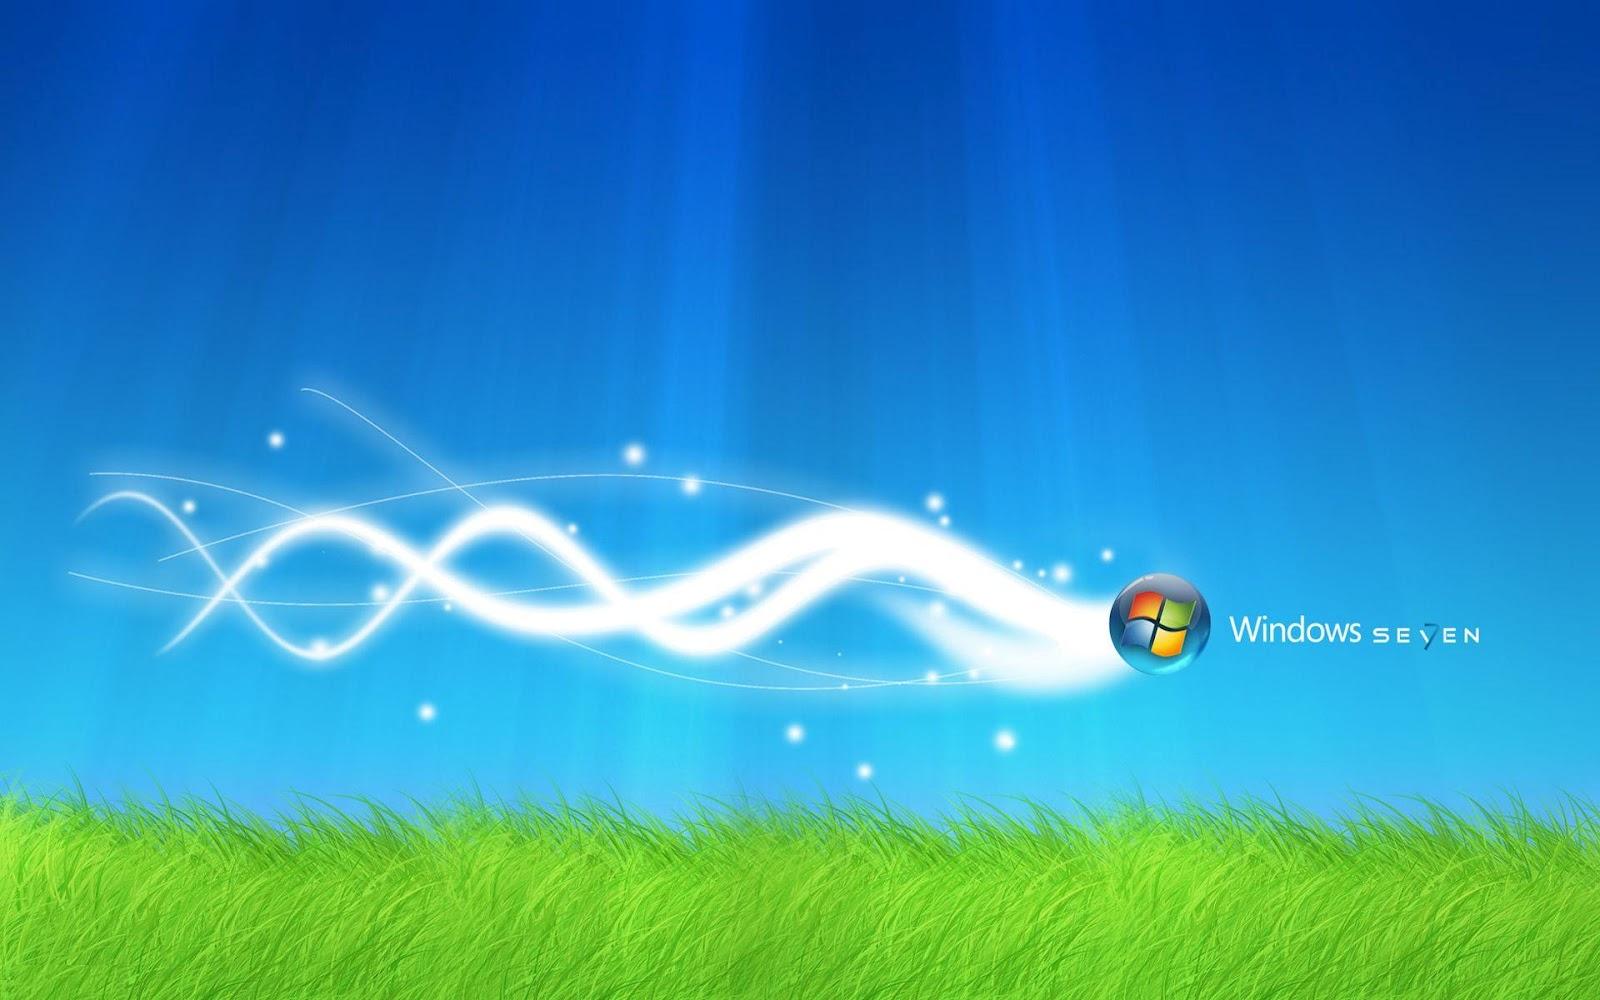 Windows 7 Desktop Backgrounds Desktop Backgrounds for Windows 7 1600x1000